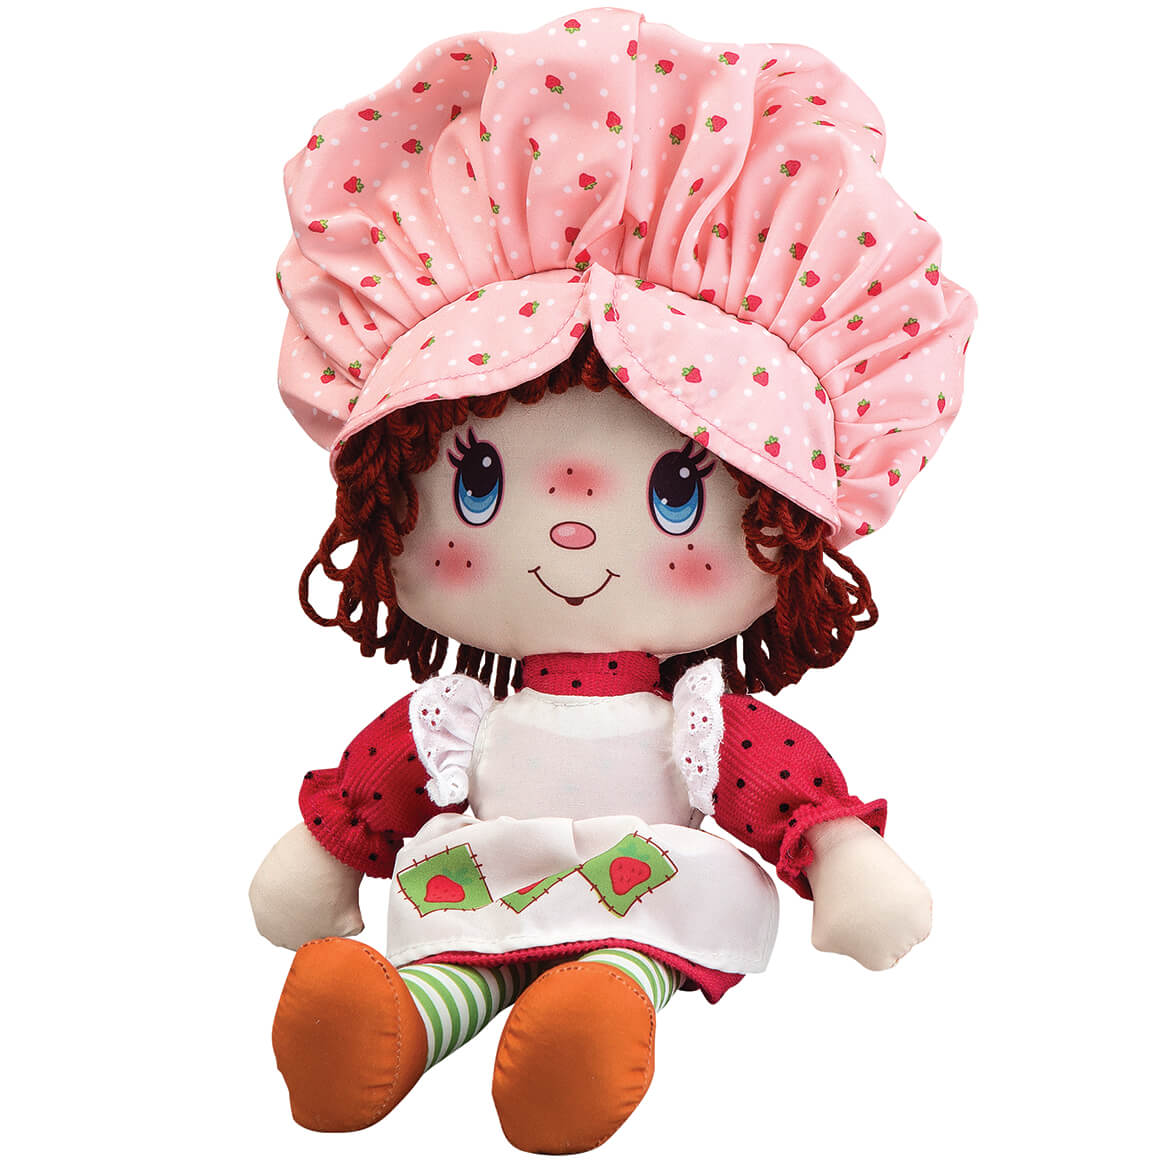 Strawberry Shortcake™ Classic Rag Doll-364084